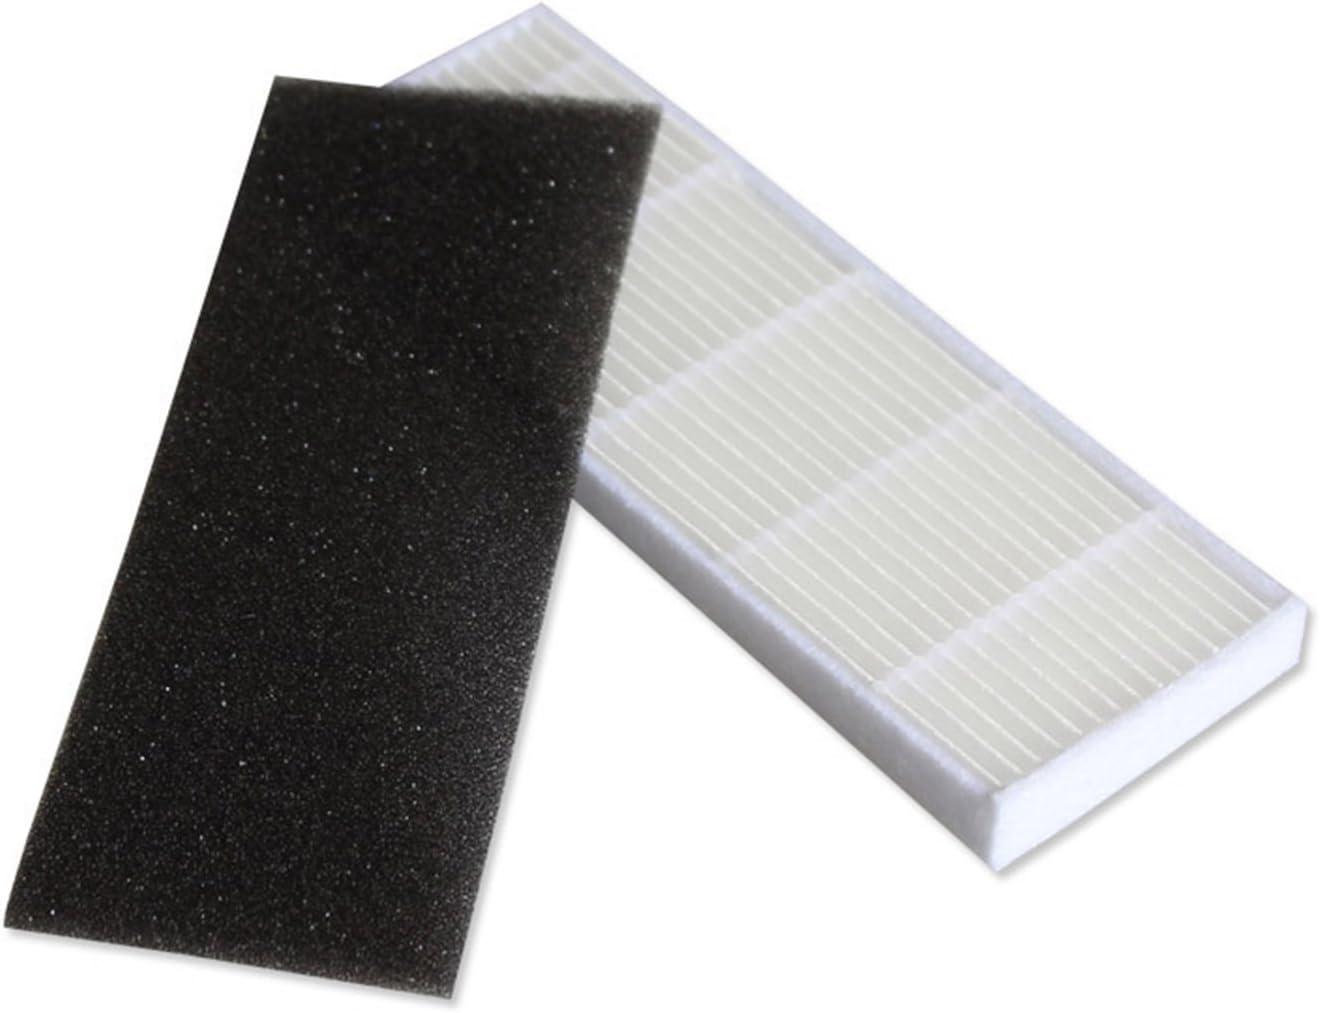 reyee 1 * principal cepillo + 5 * Filtro HEPA + 5 * esponja + 10 ...